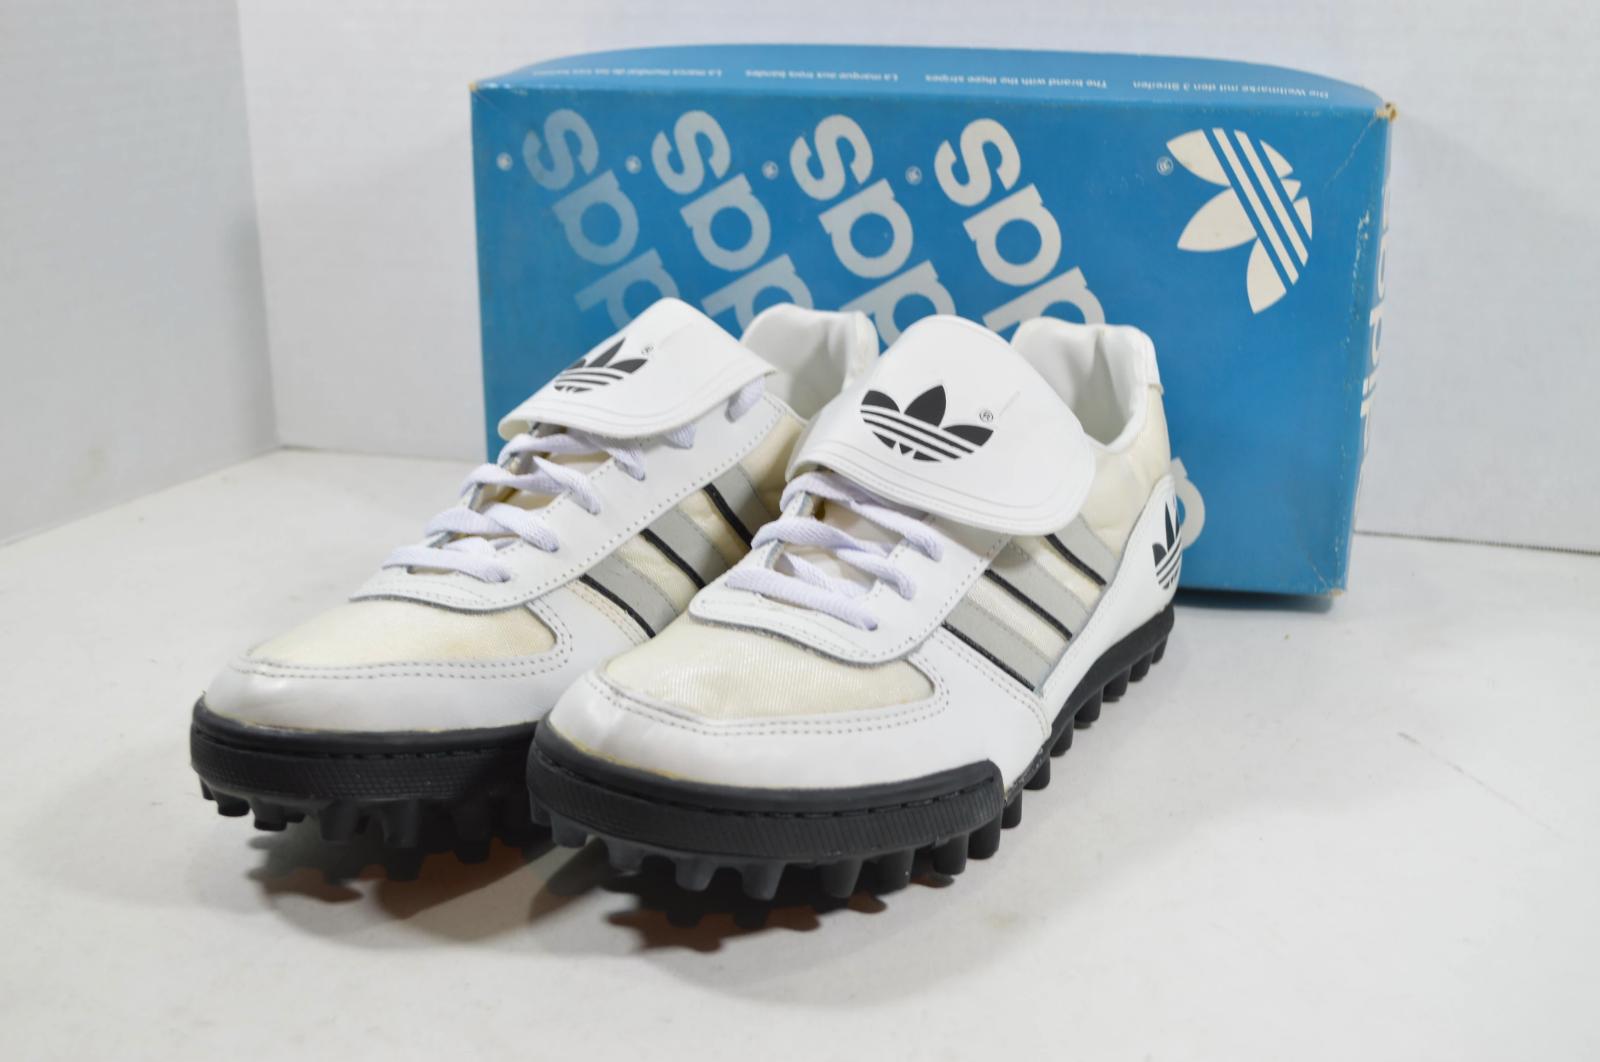 Vintage Anni 80 Nuova Adidas Uomo 6.5 Sudden Impact Calcio Turf Tacchetti Bianco